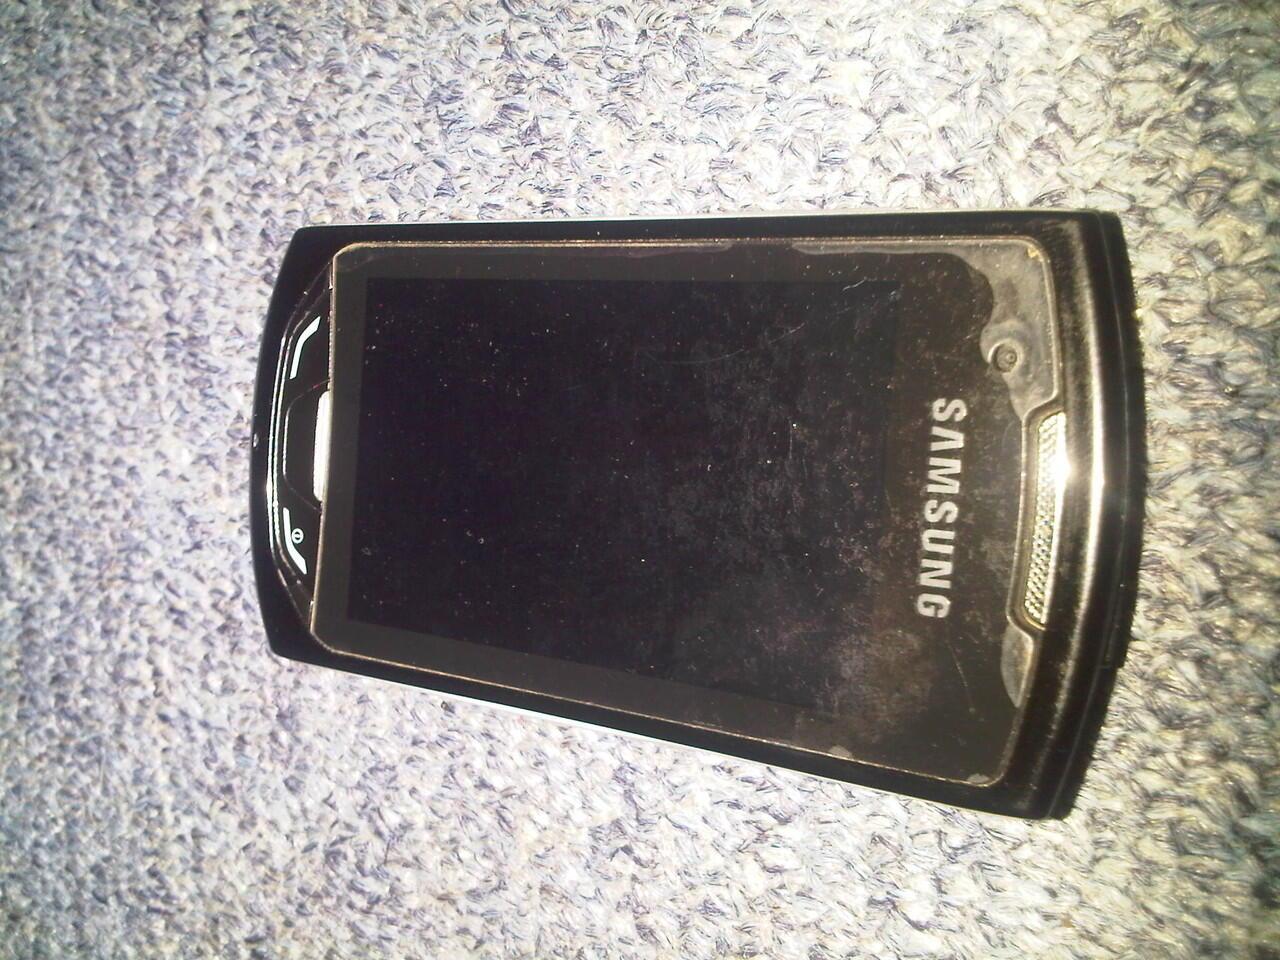 Samsung Monte fullset Bandung